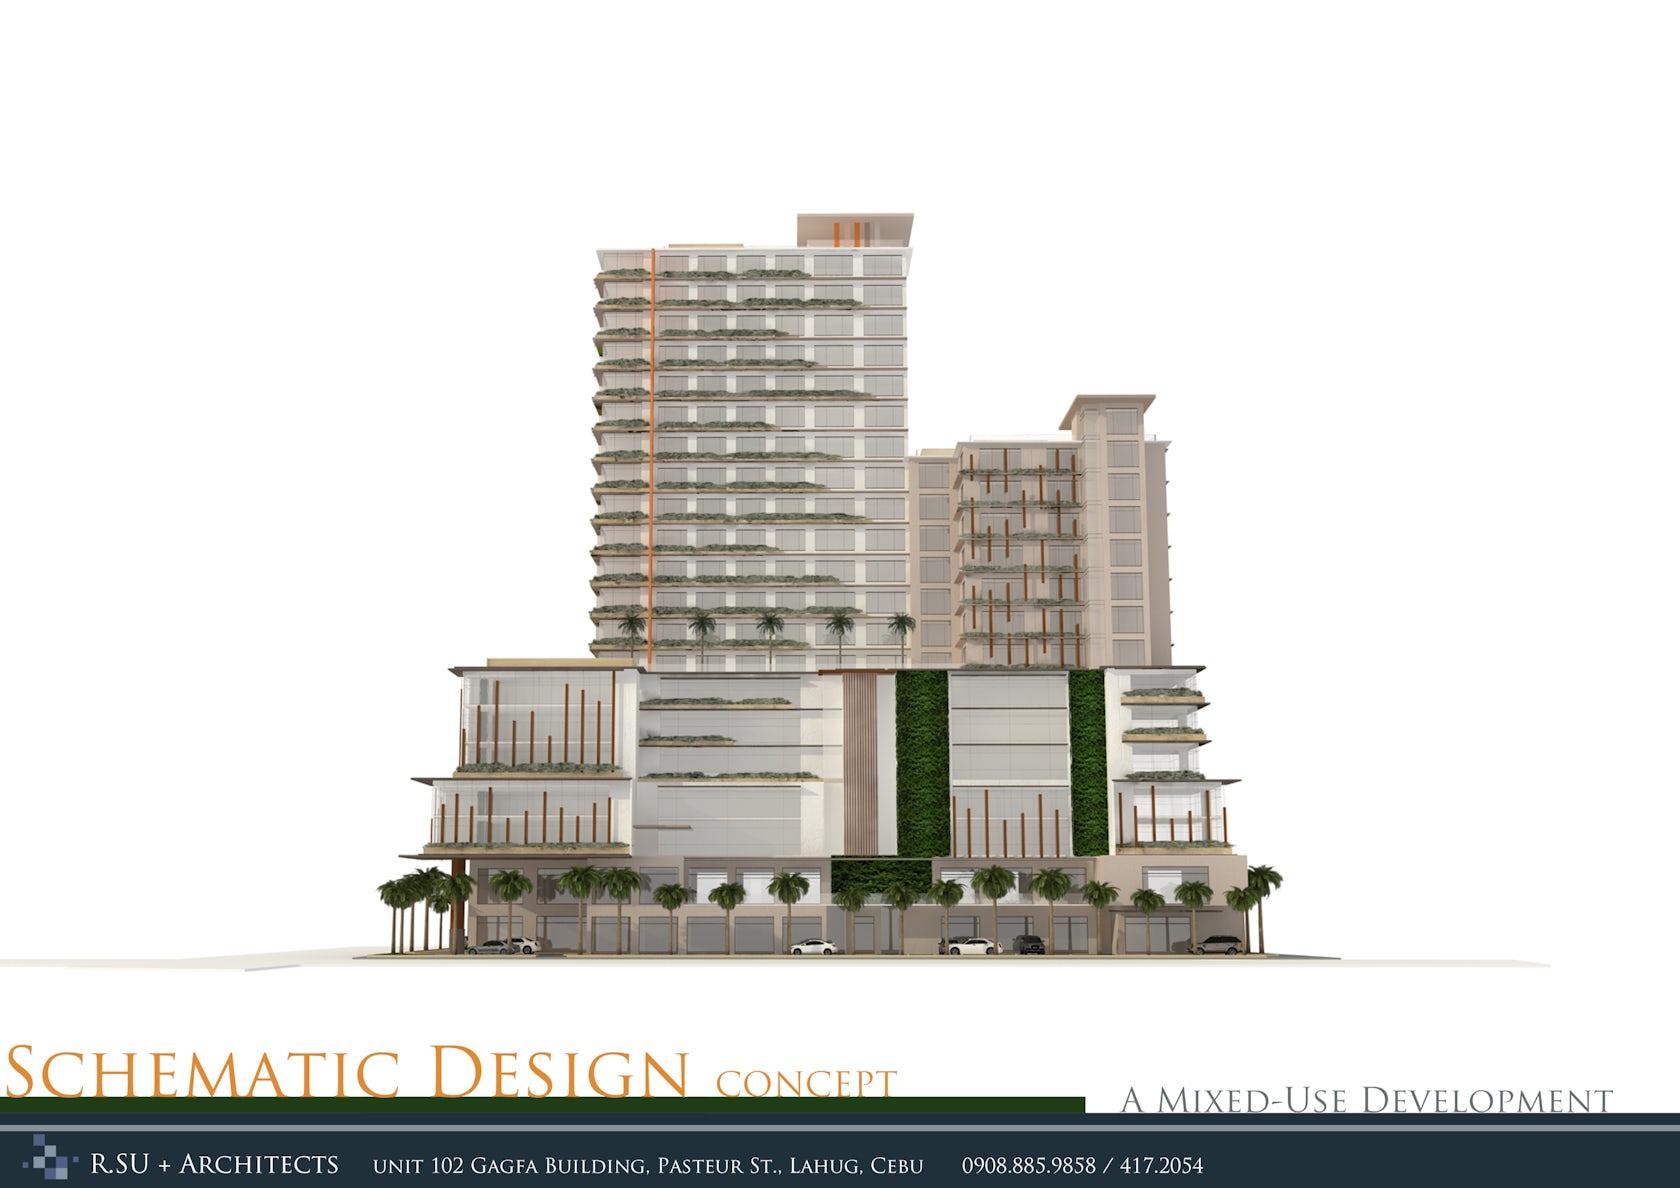 Cebu Mixed-Use Development on Architizer